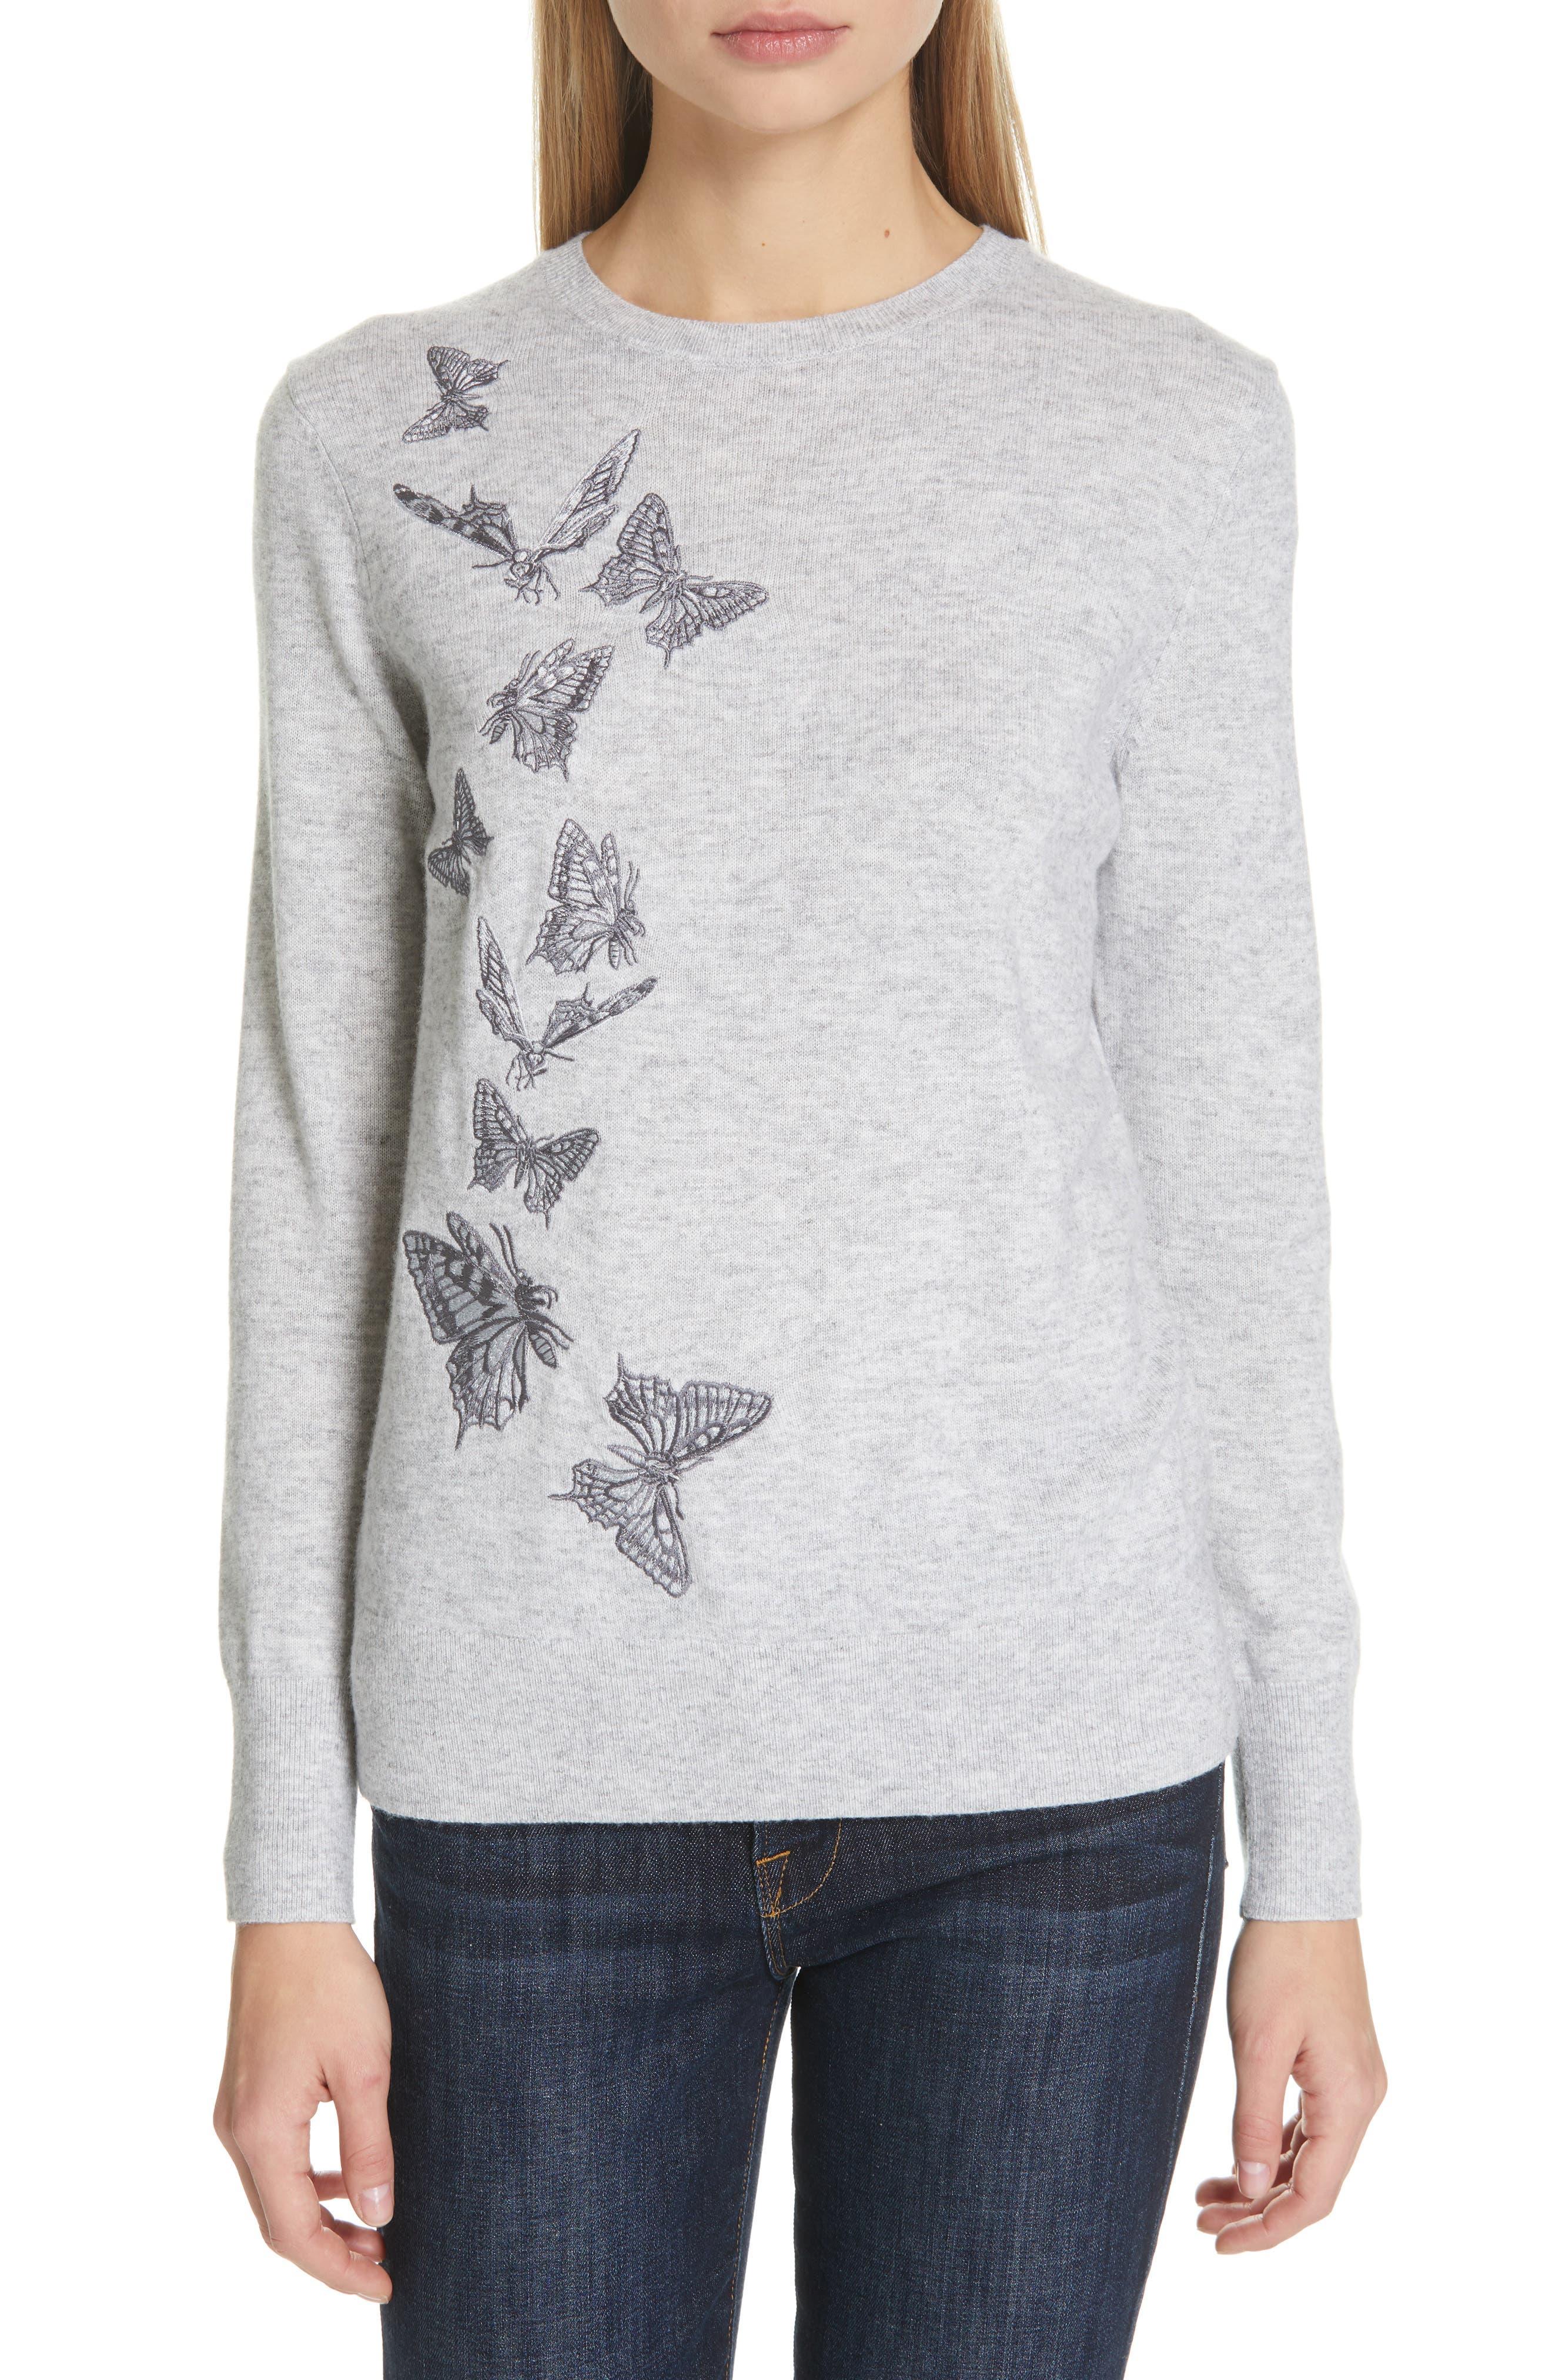 TED BAKER LONDON,                             Redinn Butterfly Sweater,                             Main thumbnail 1, color,                             GREY